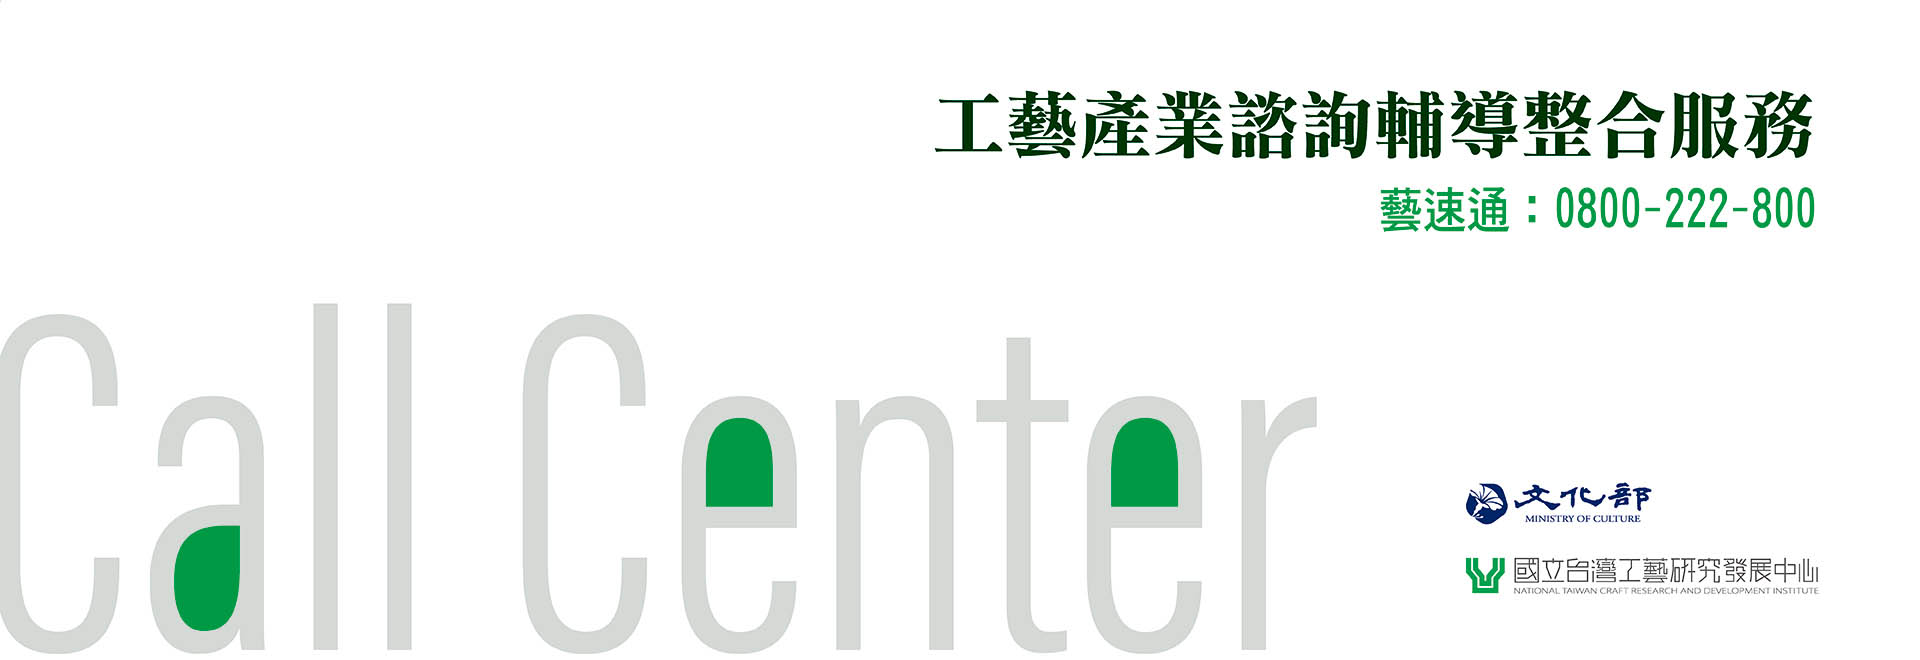 Call Center工藝產業諮詢輔導整合服務(0800-222-800) -pc